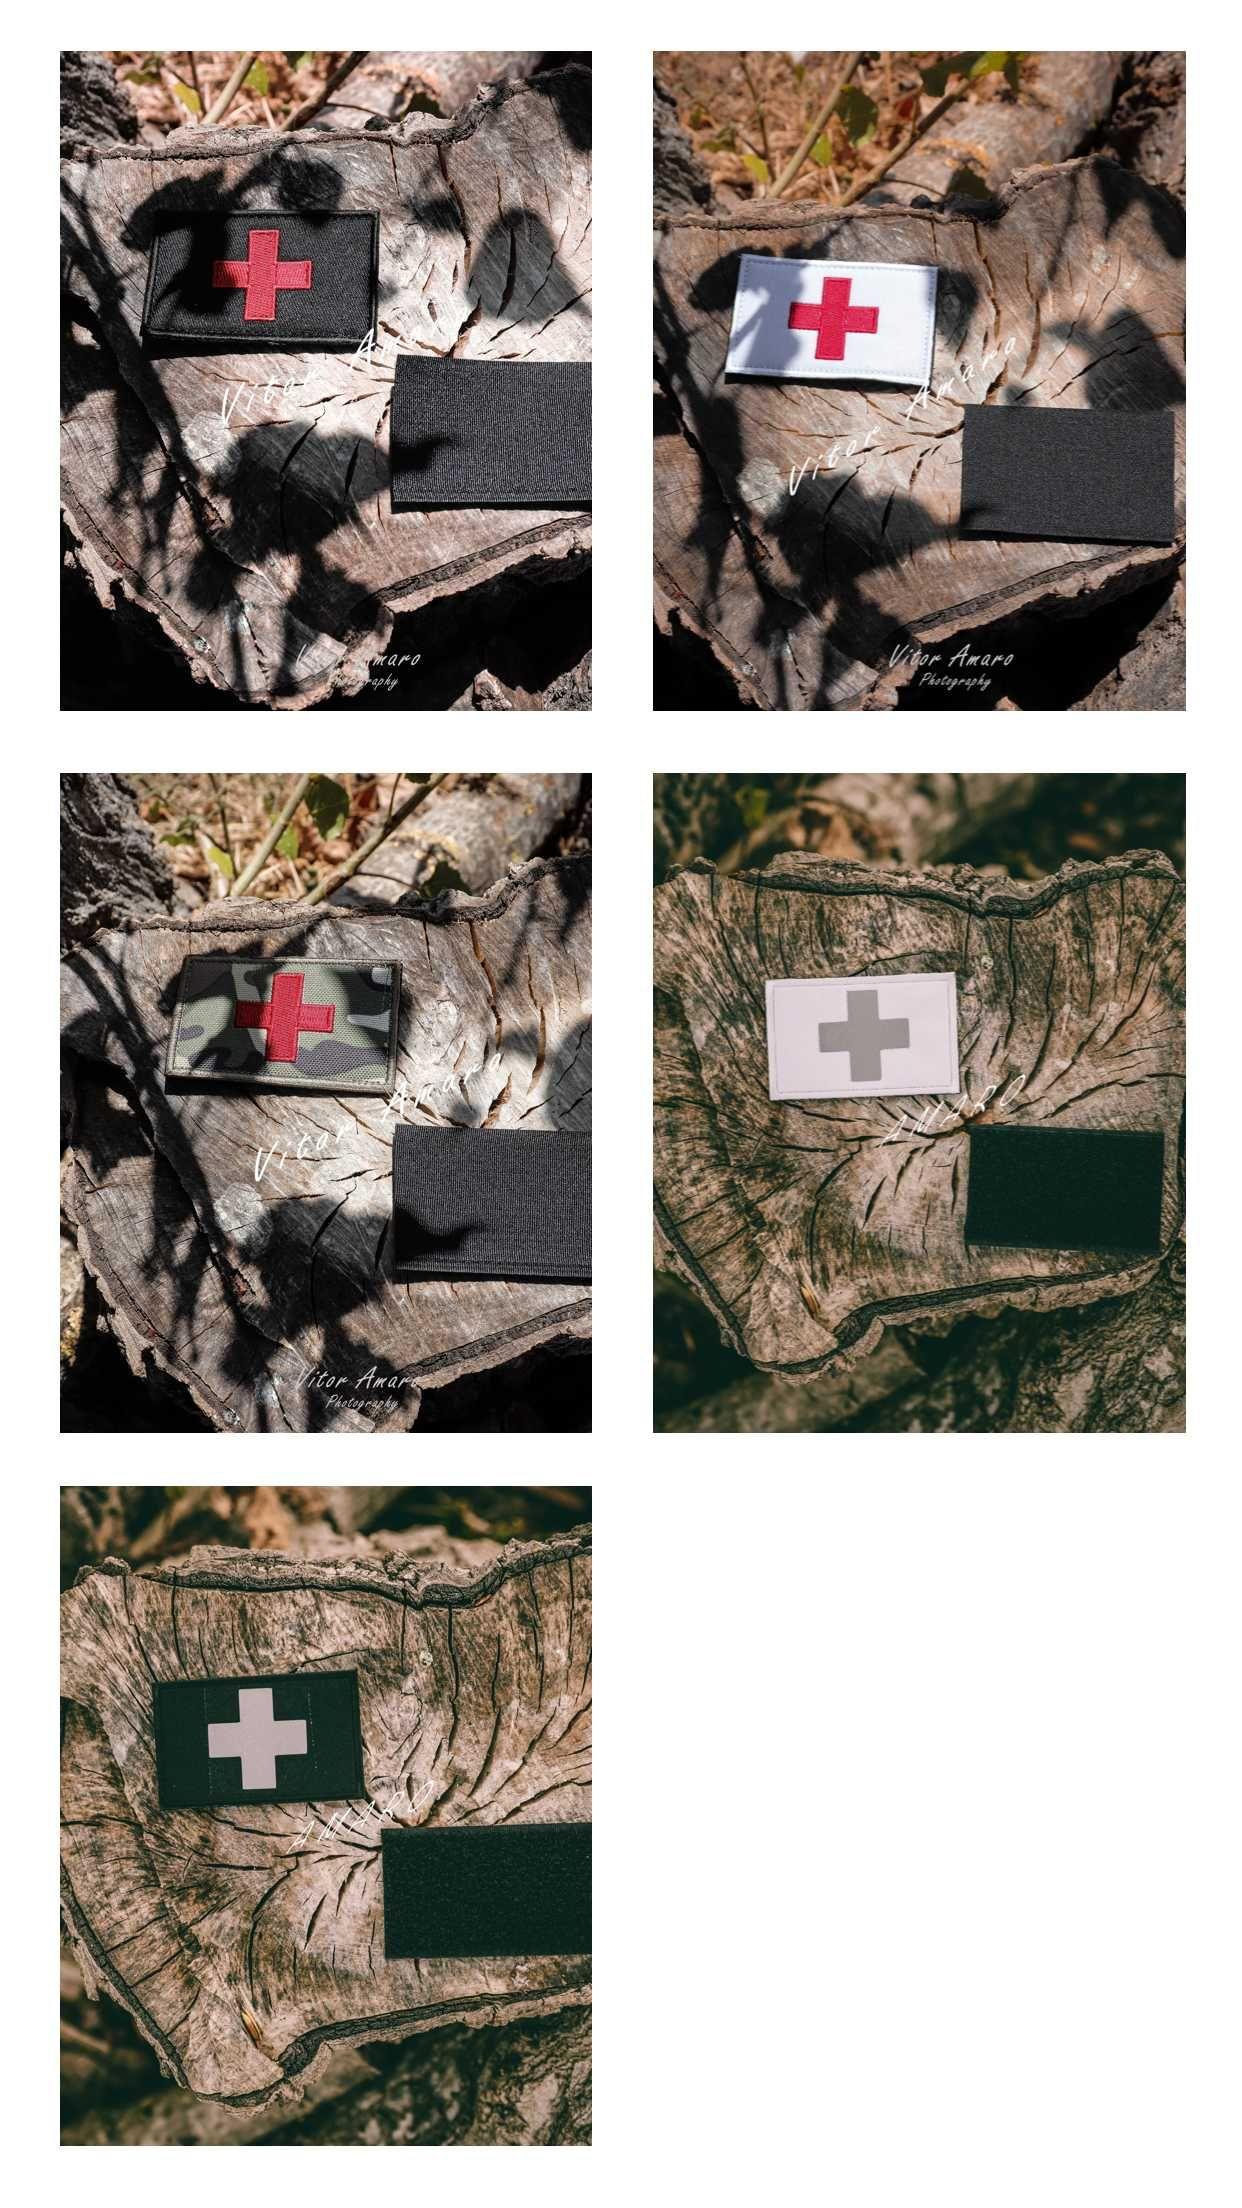 Bandeira de Socorrista Velcro para Caça Exercito Airsoft (5 Modelos)